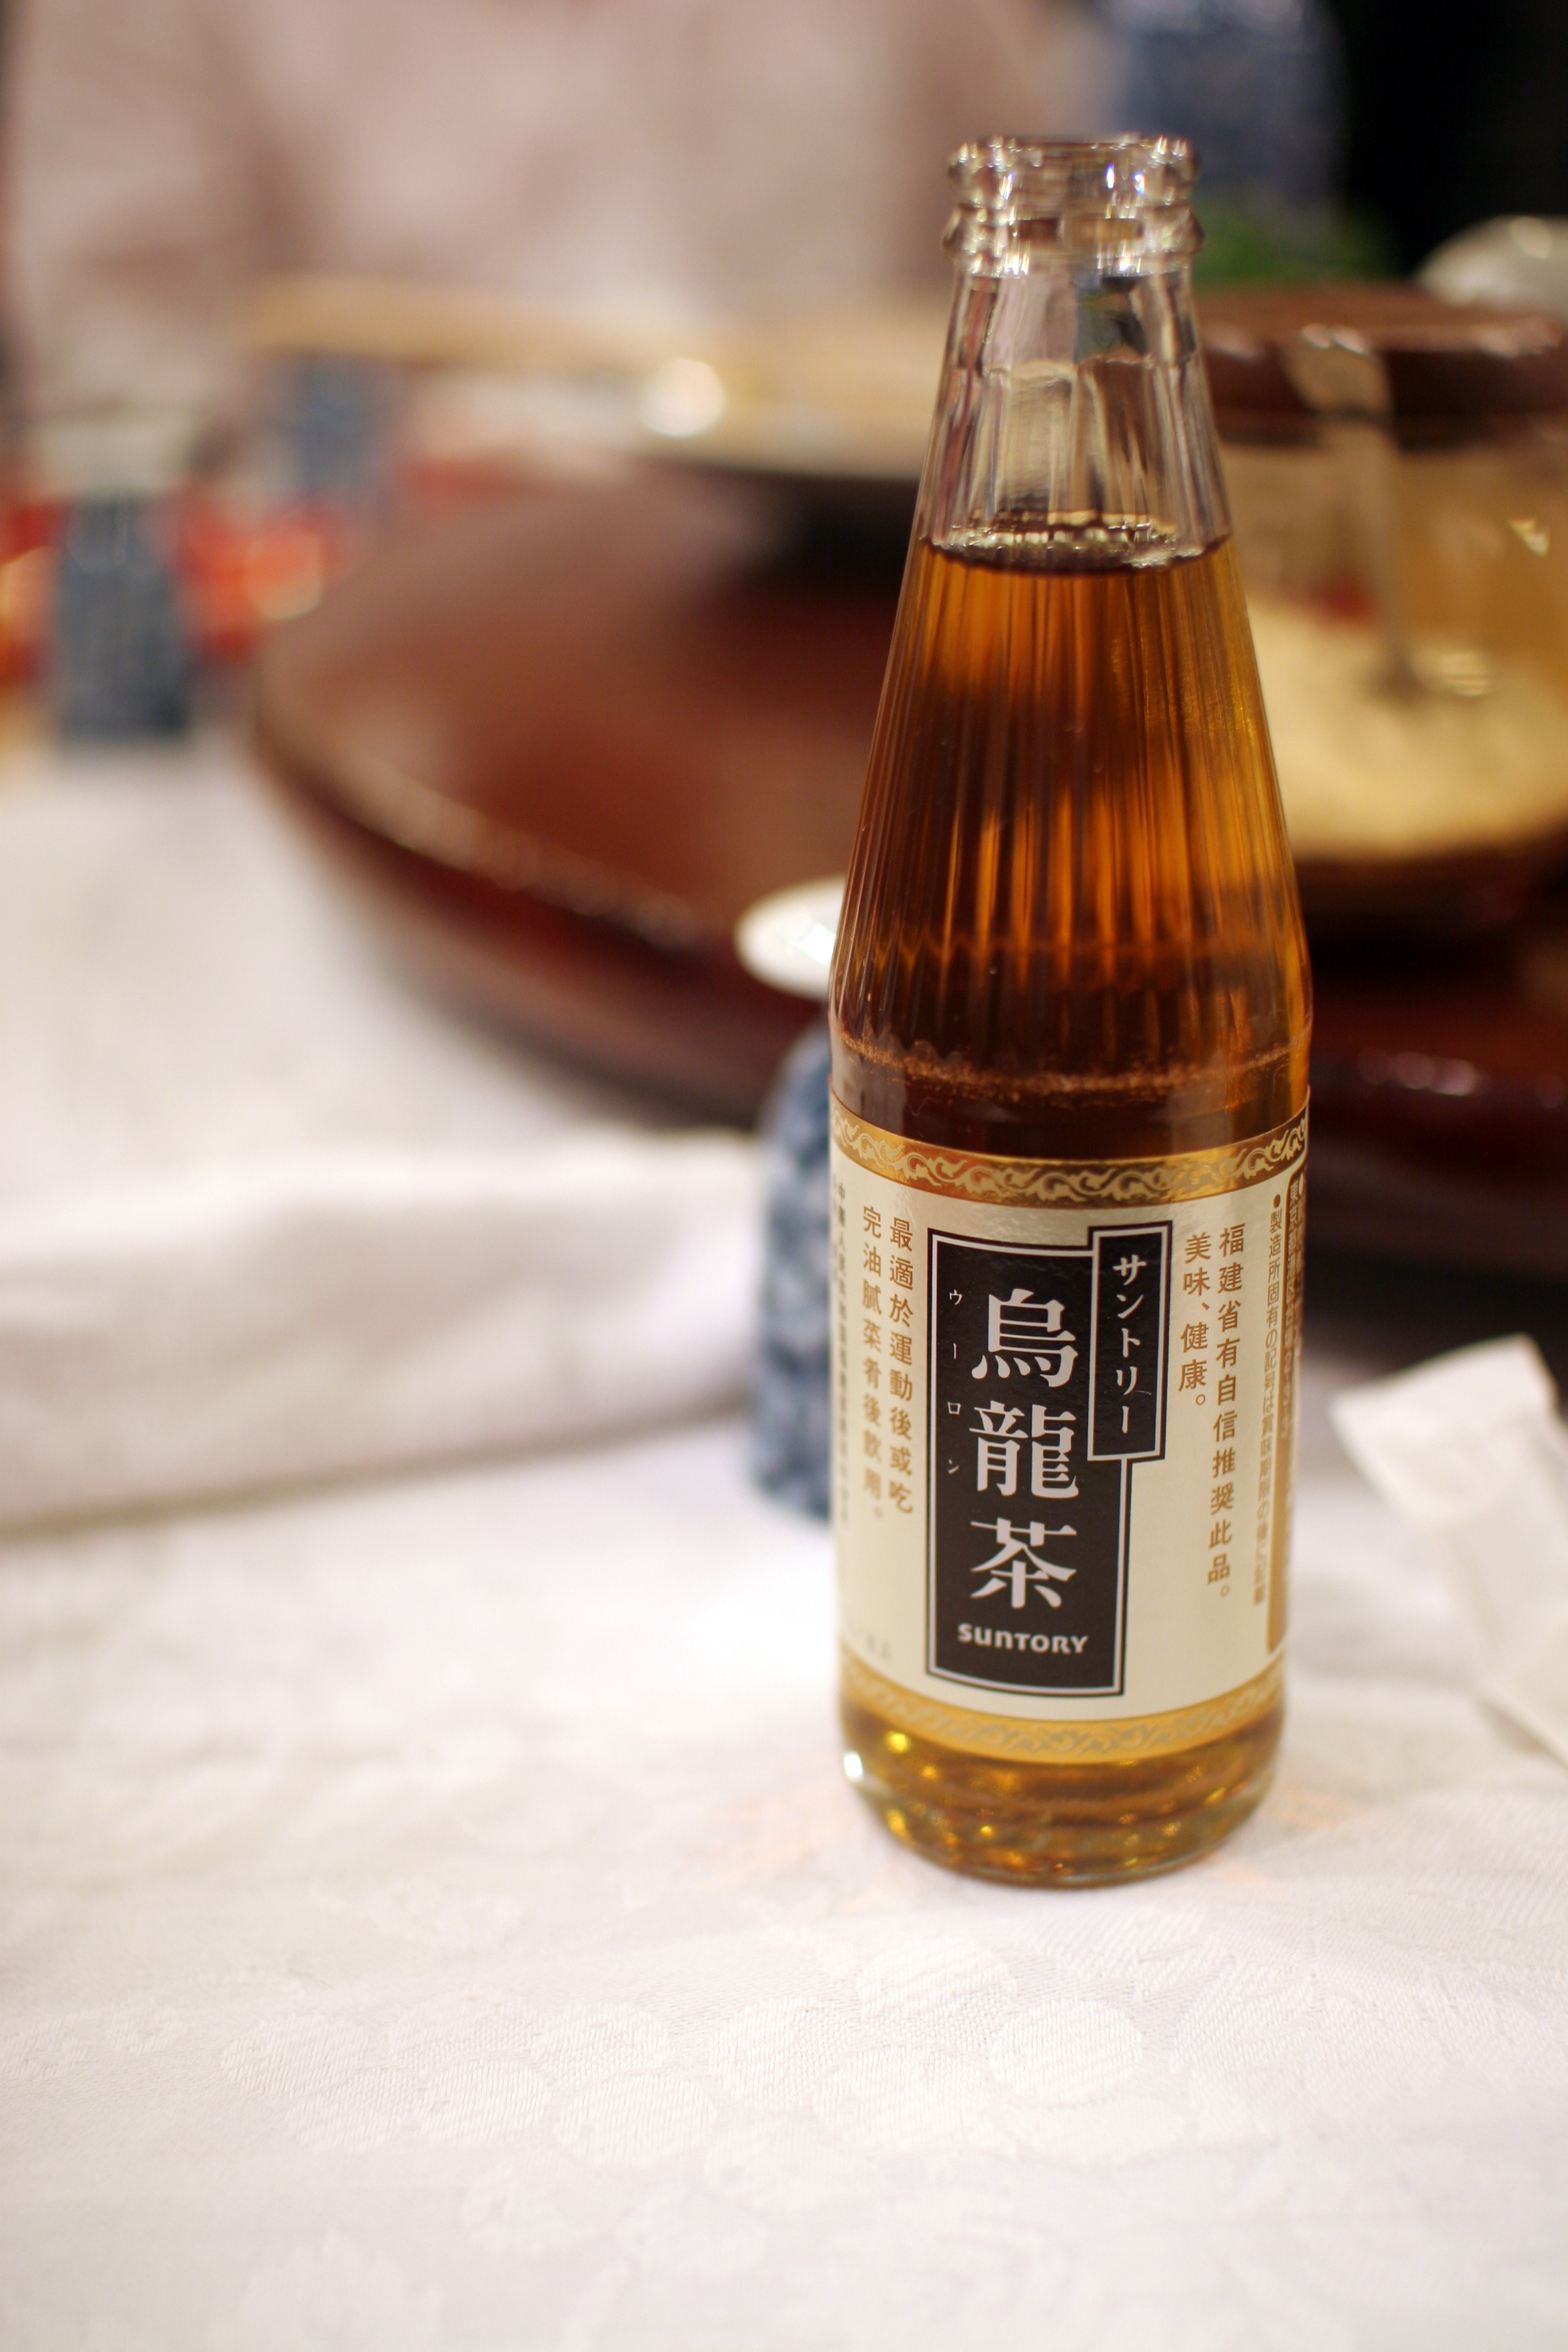 File:Suntory oolong tea bottle 20070223.jpg - Wikimedia Commons